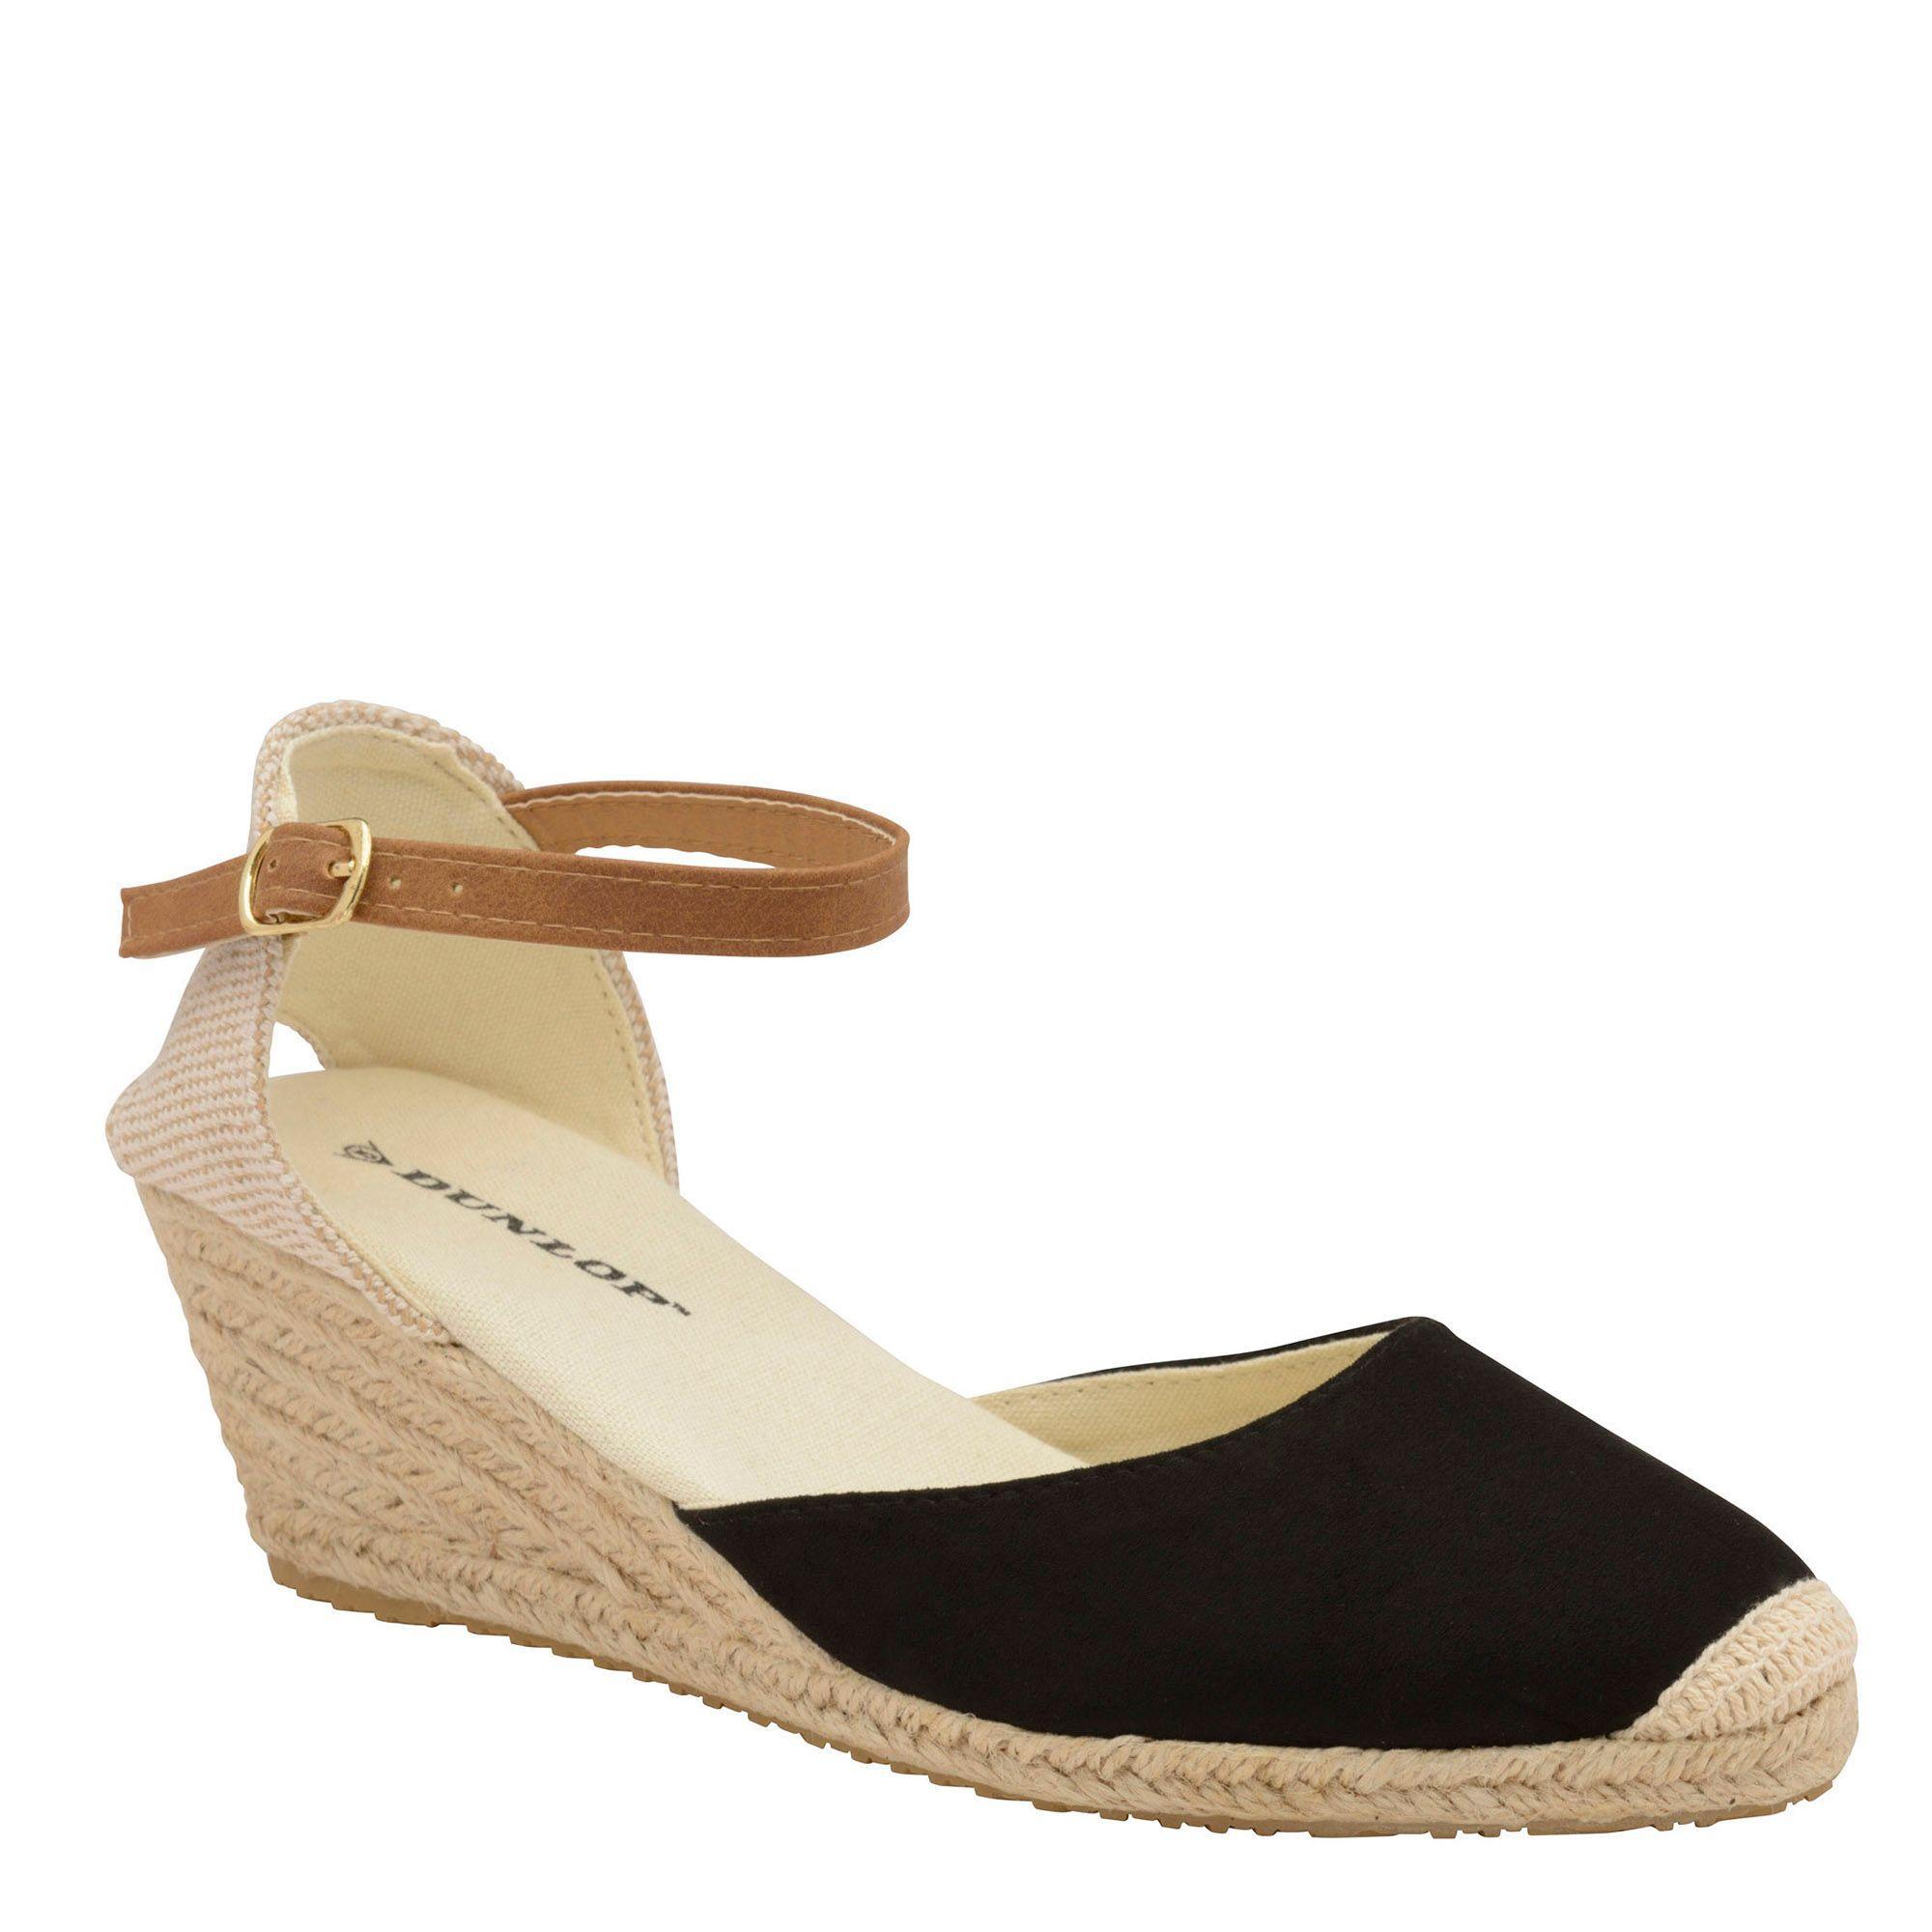 860fd0a63b Dunlop Black Microfibre 'rana' Wedge Sandals in Black - Save 33% - Lyst